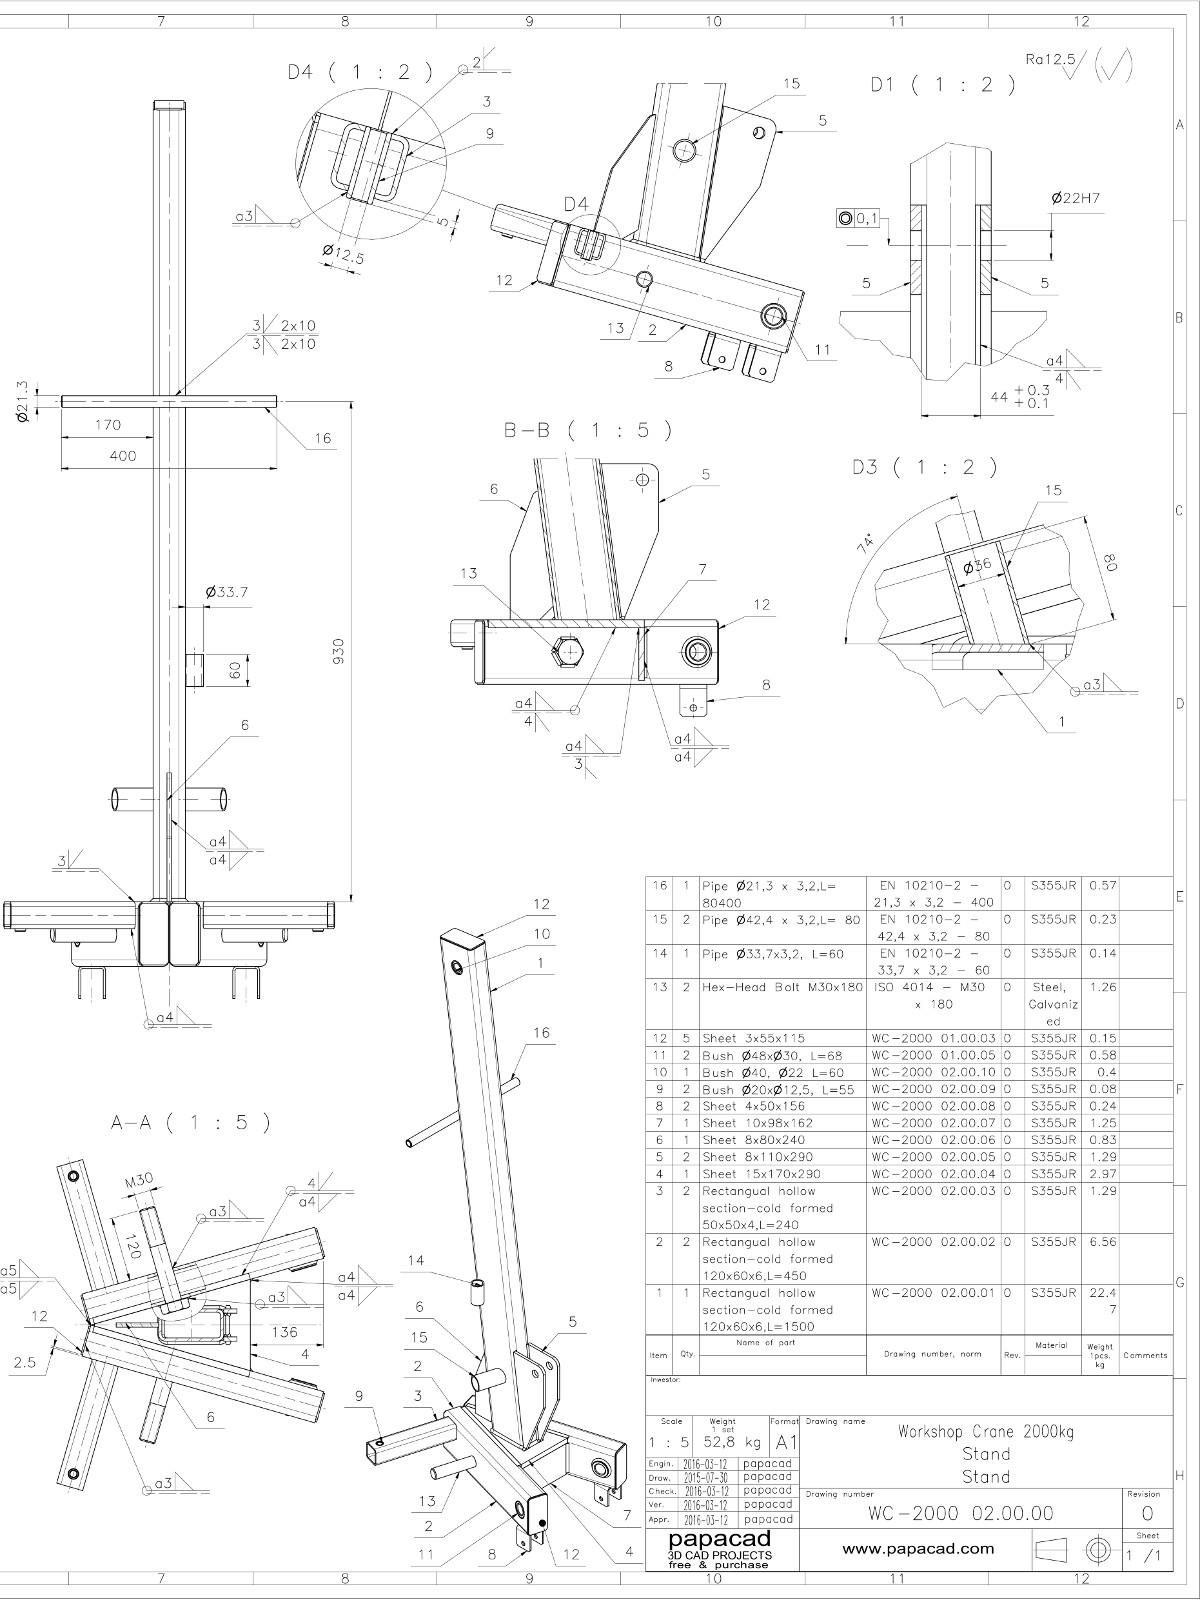 Shop Crane Design Download Cad Hydraulic Foldable Plans Schematic Diy Workshop Project Pdf